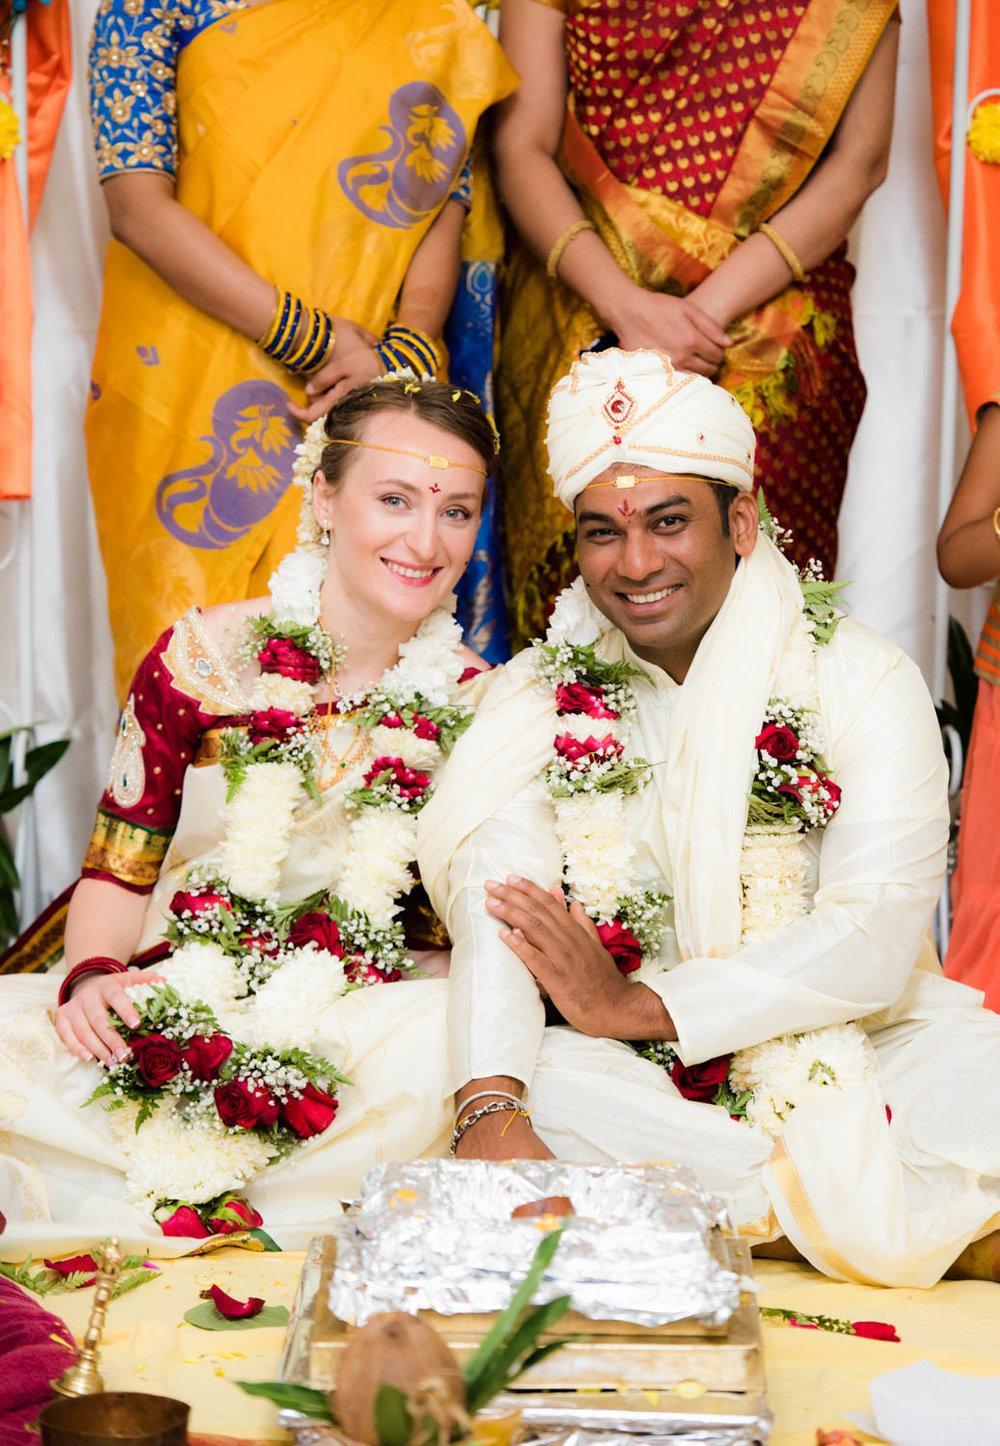 ecaterina-chandu-indian-wedding25.jpg